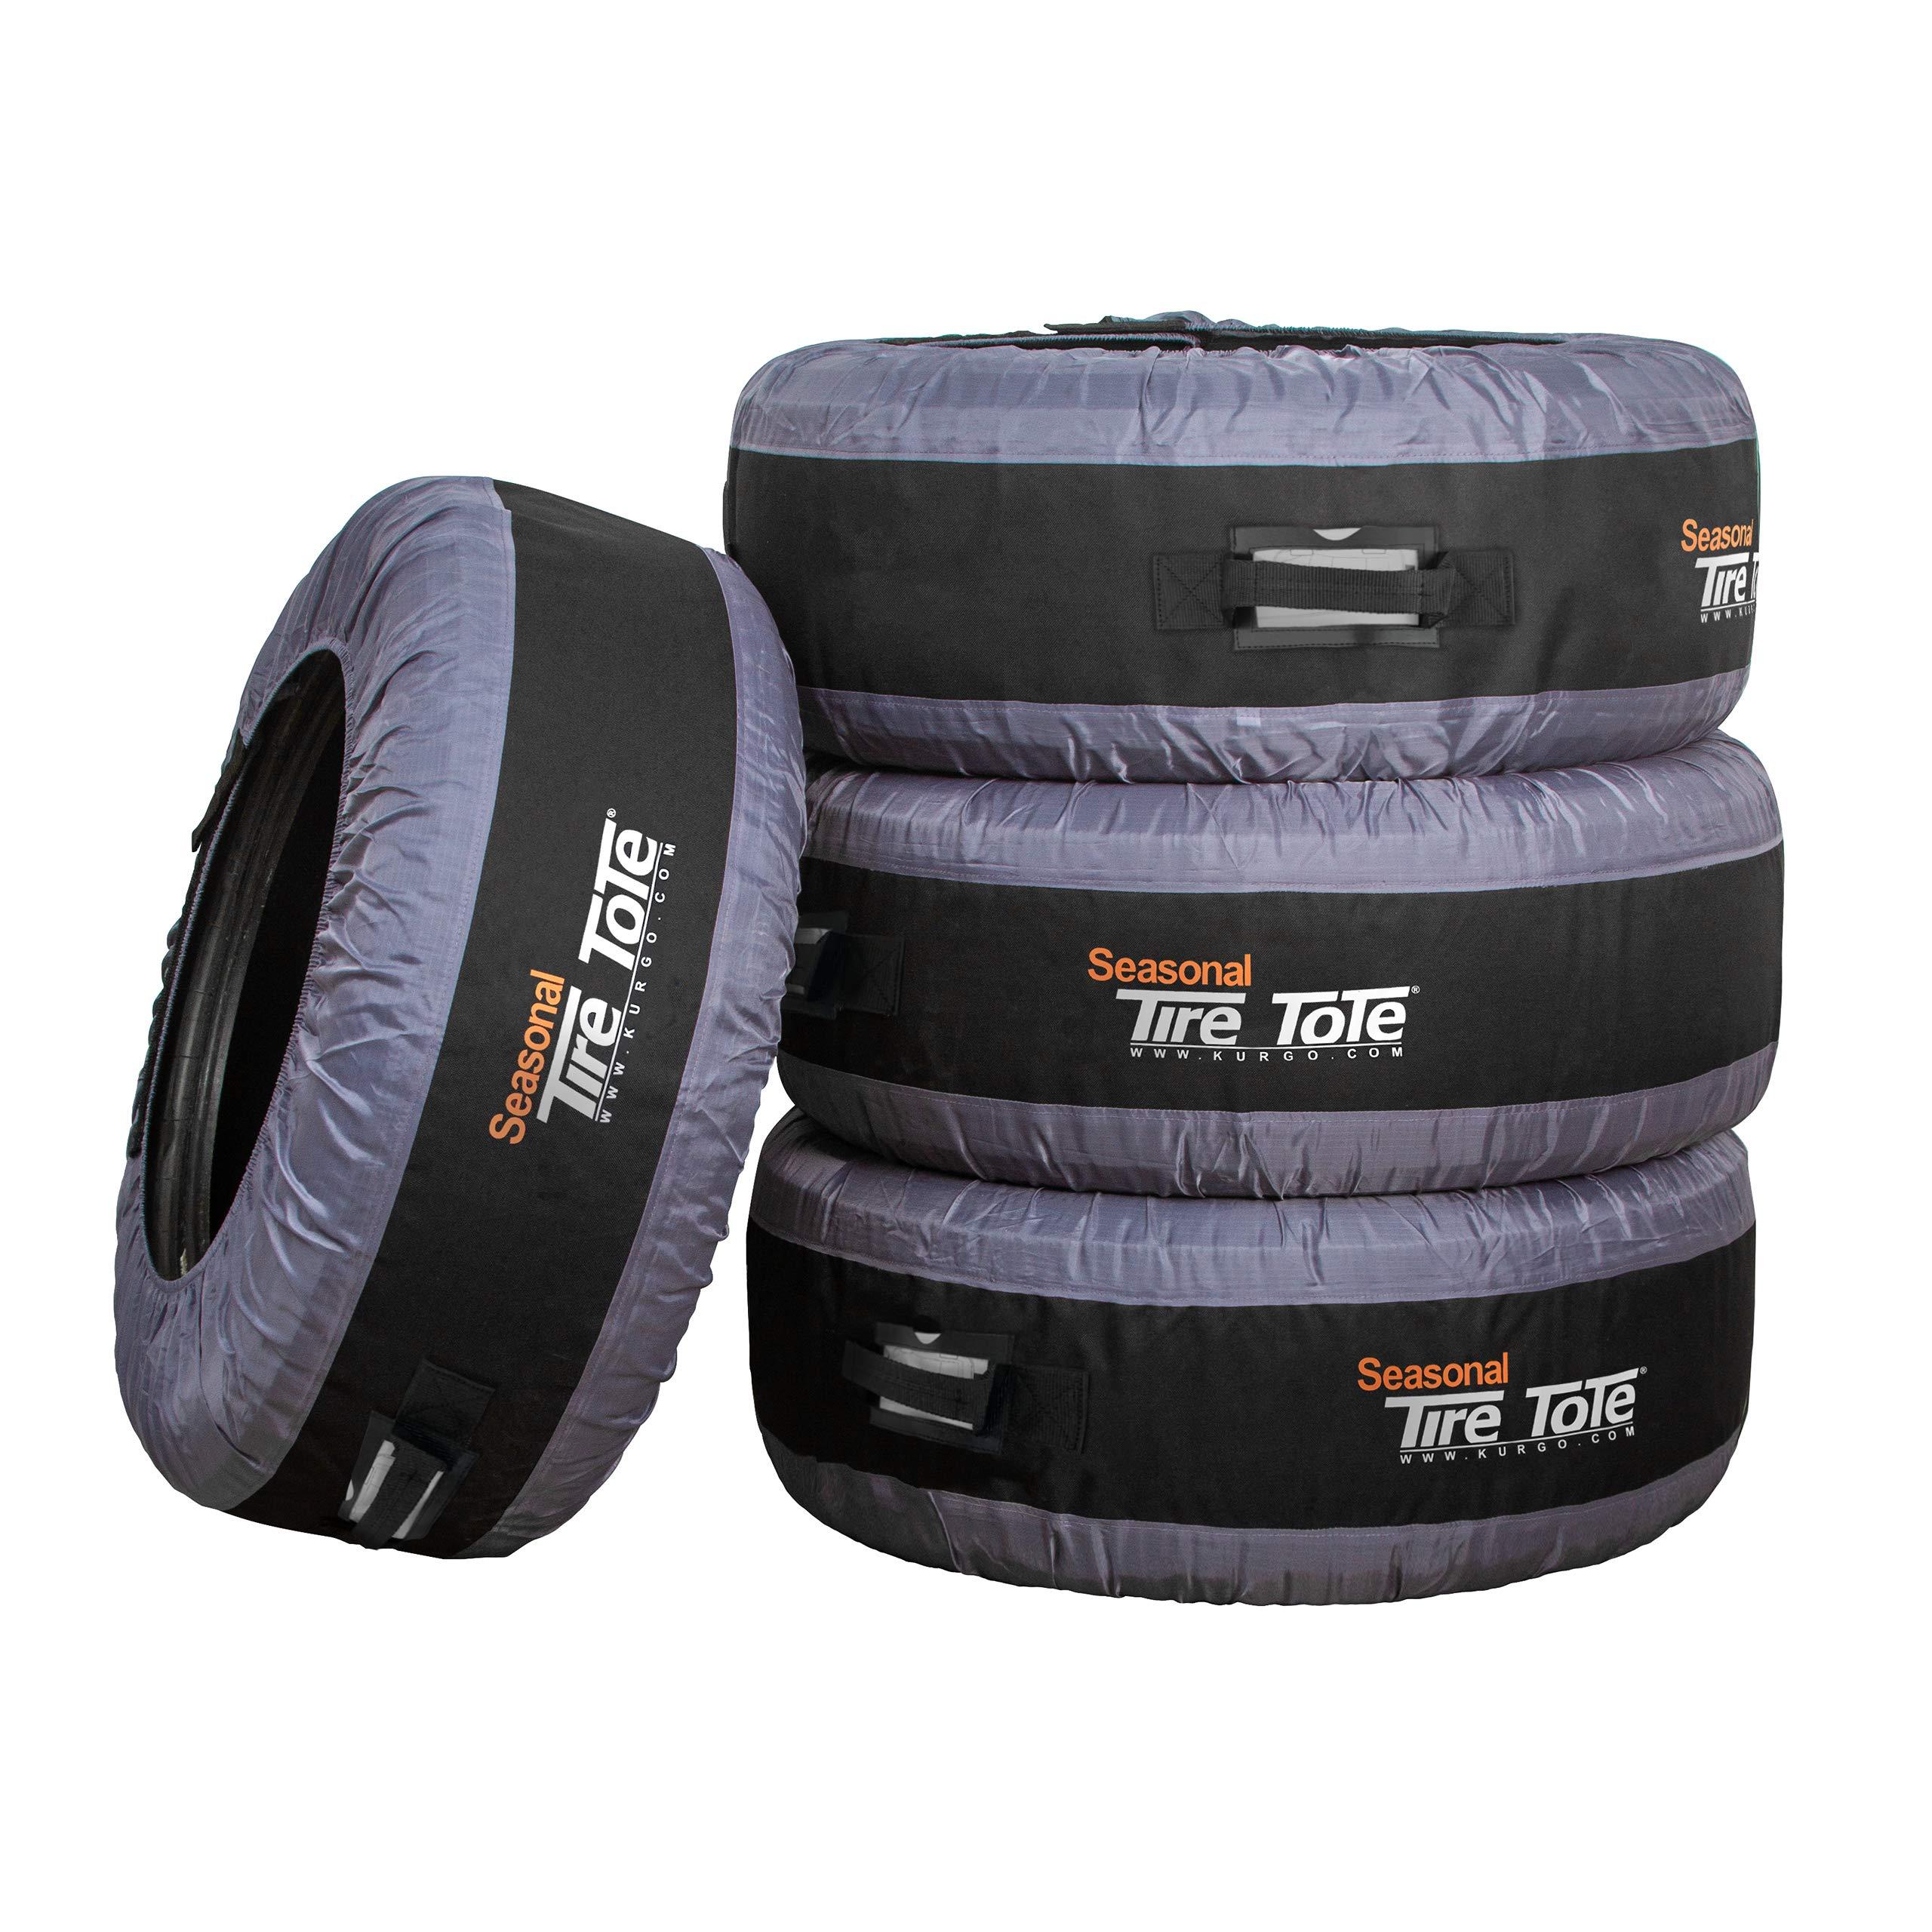 Kurgo Tire Cover & Seasonal Tire Tote (TM) - Pack of 4 (00036)